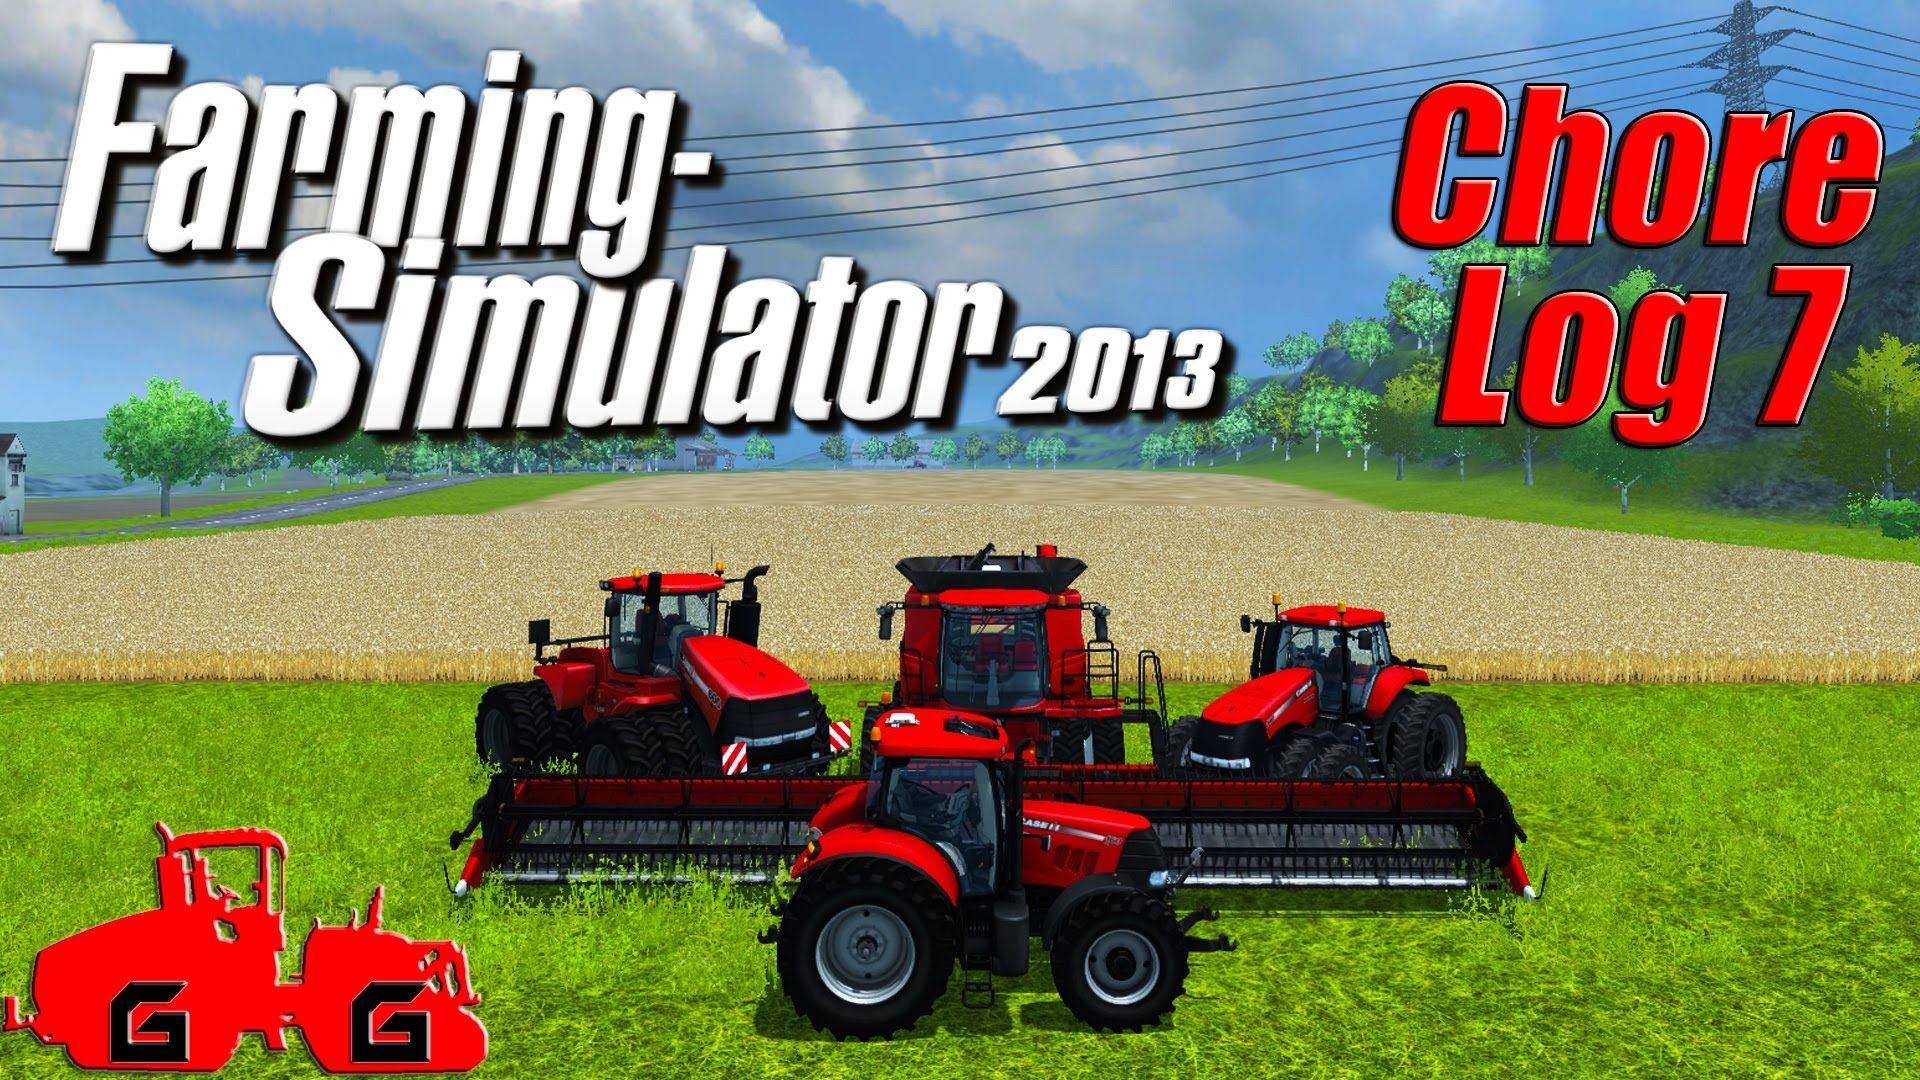 Farming Simulator 2013: Chore Log 7 - Tractor Sale! | evan